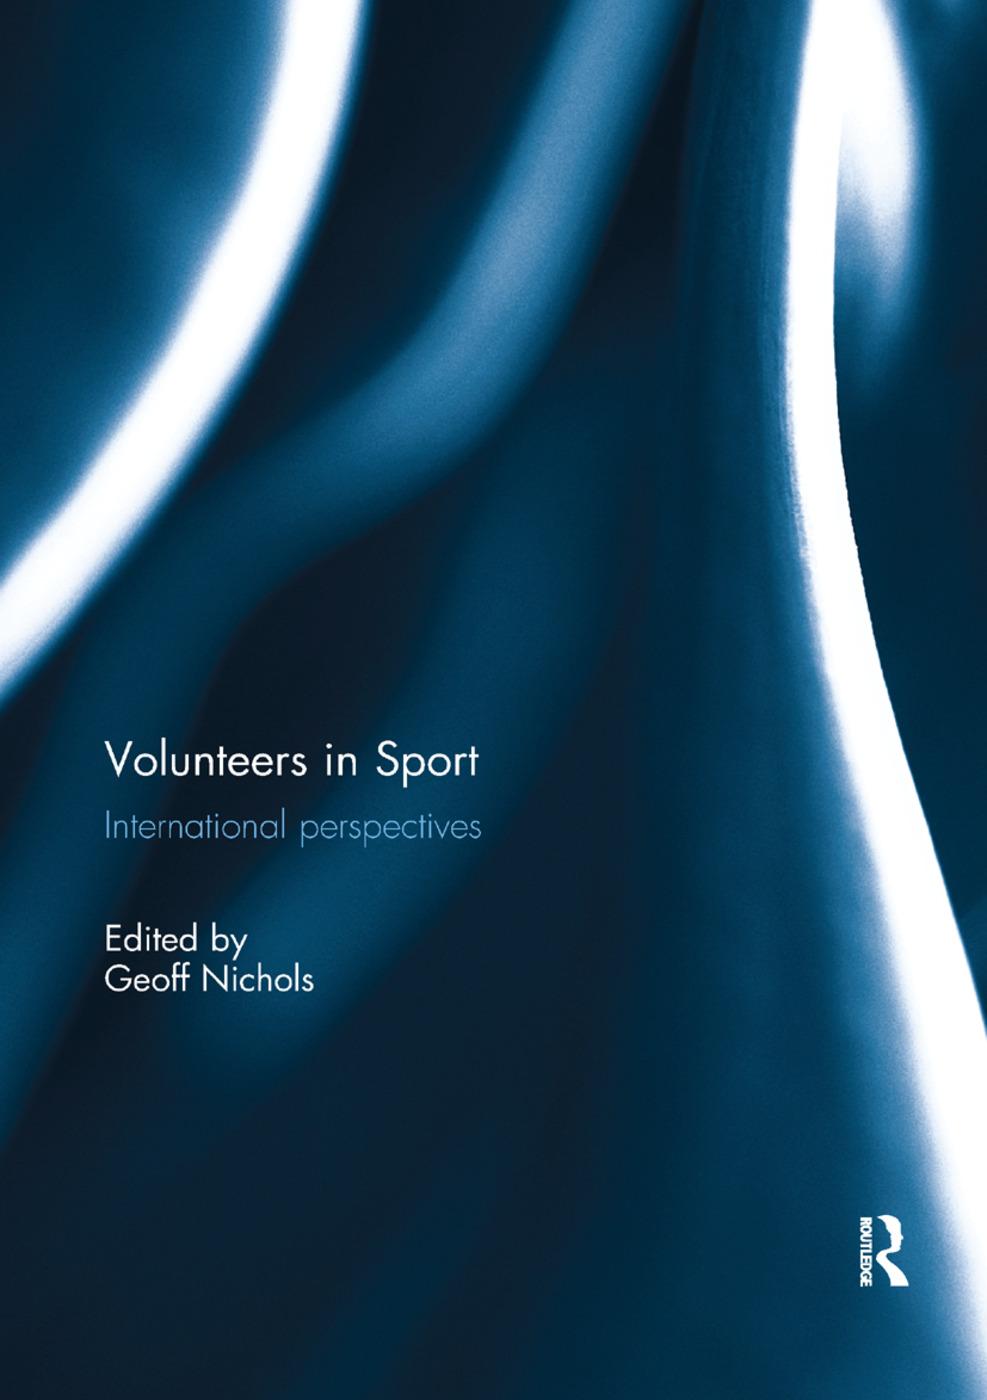 Volunteers in Sport: International perspectives book cover